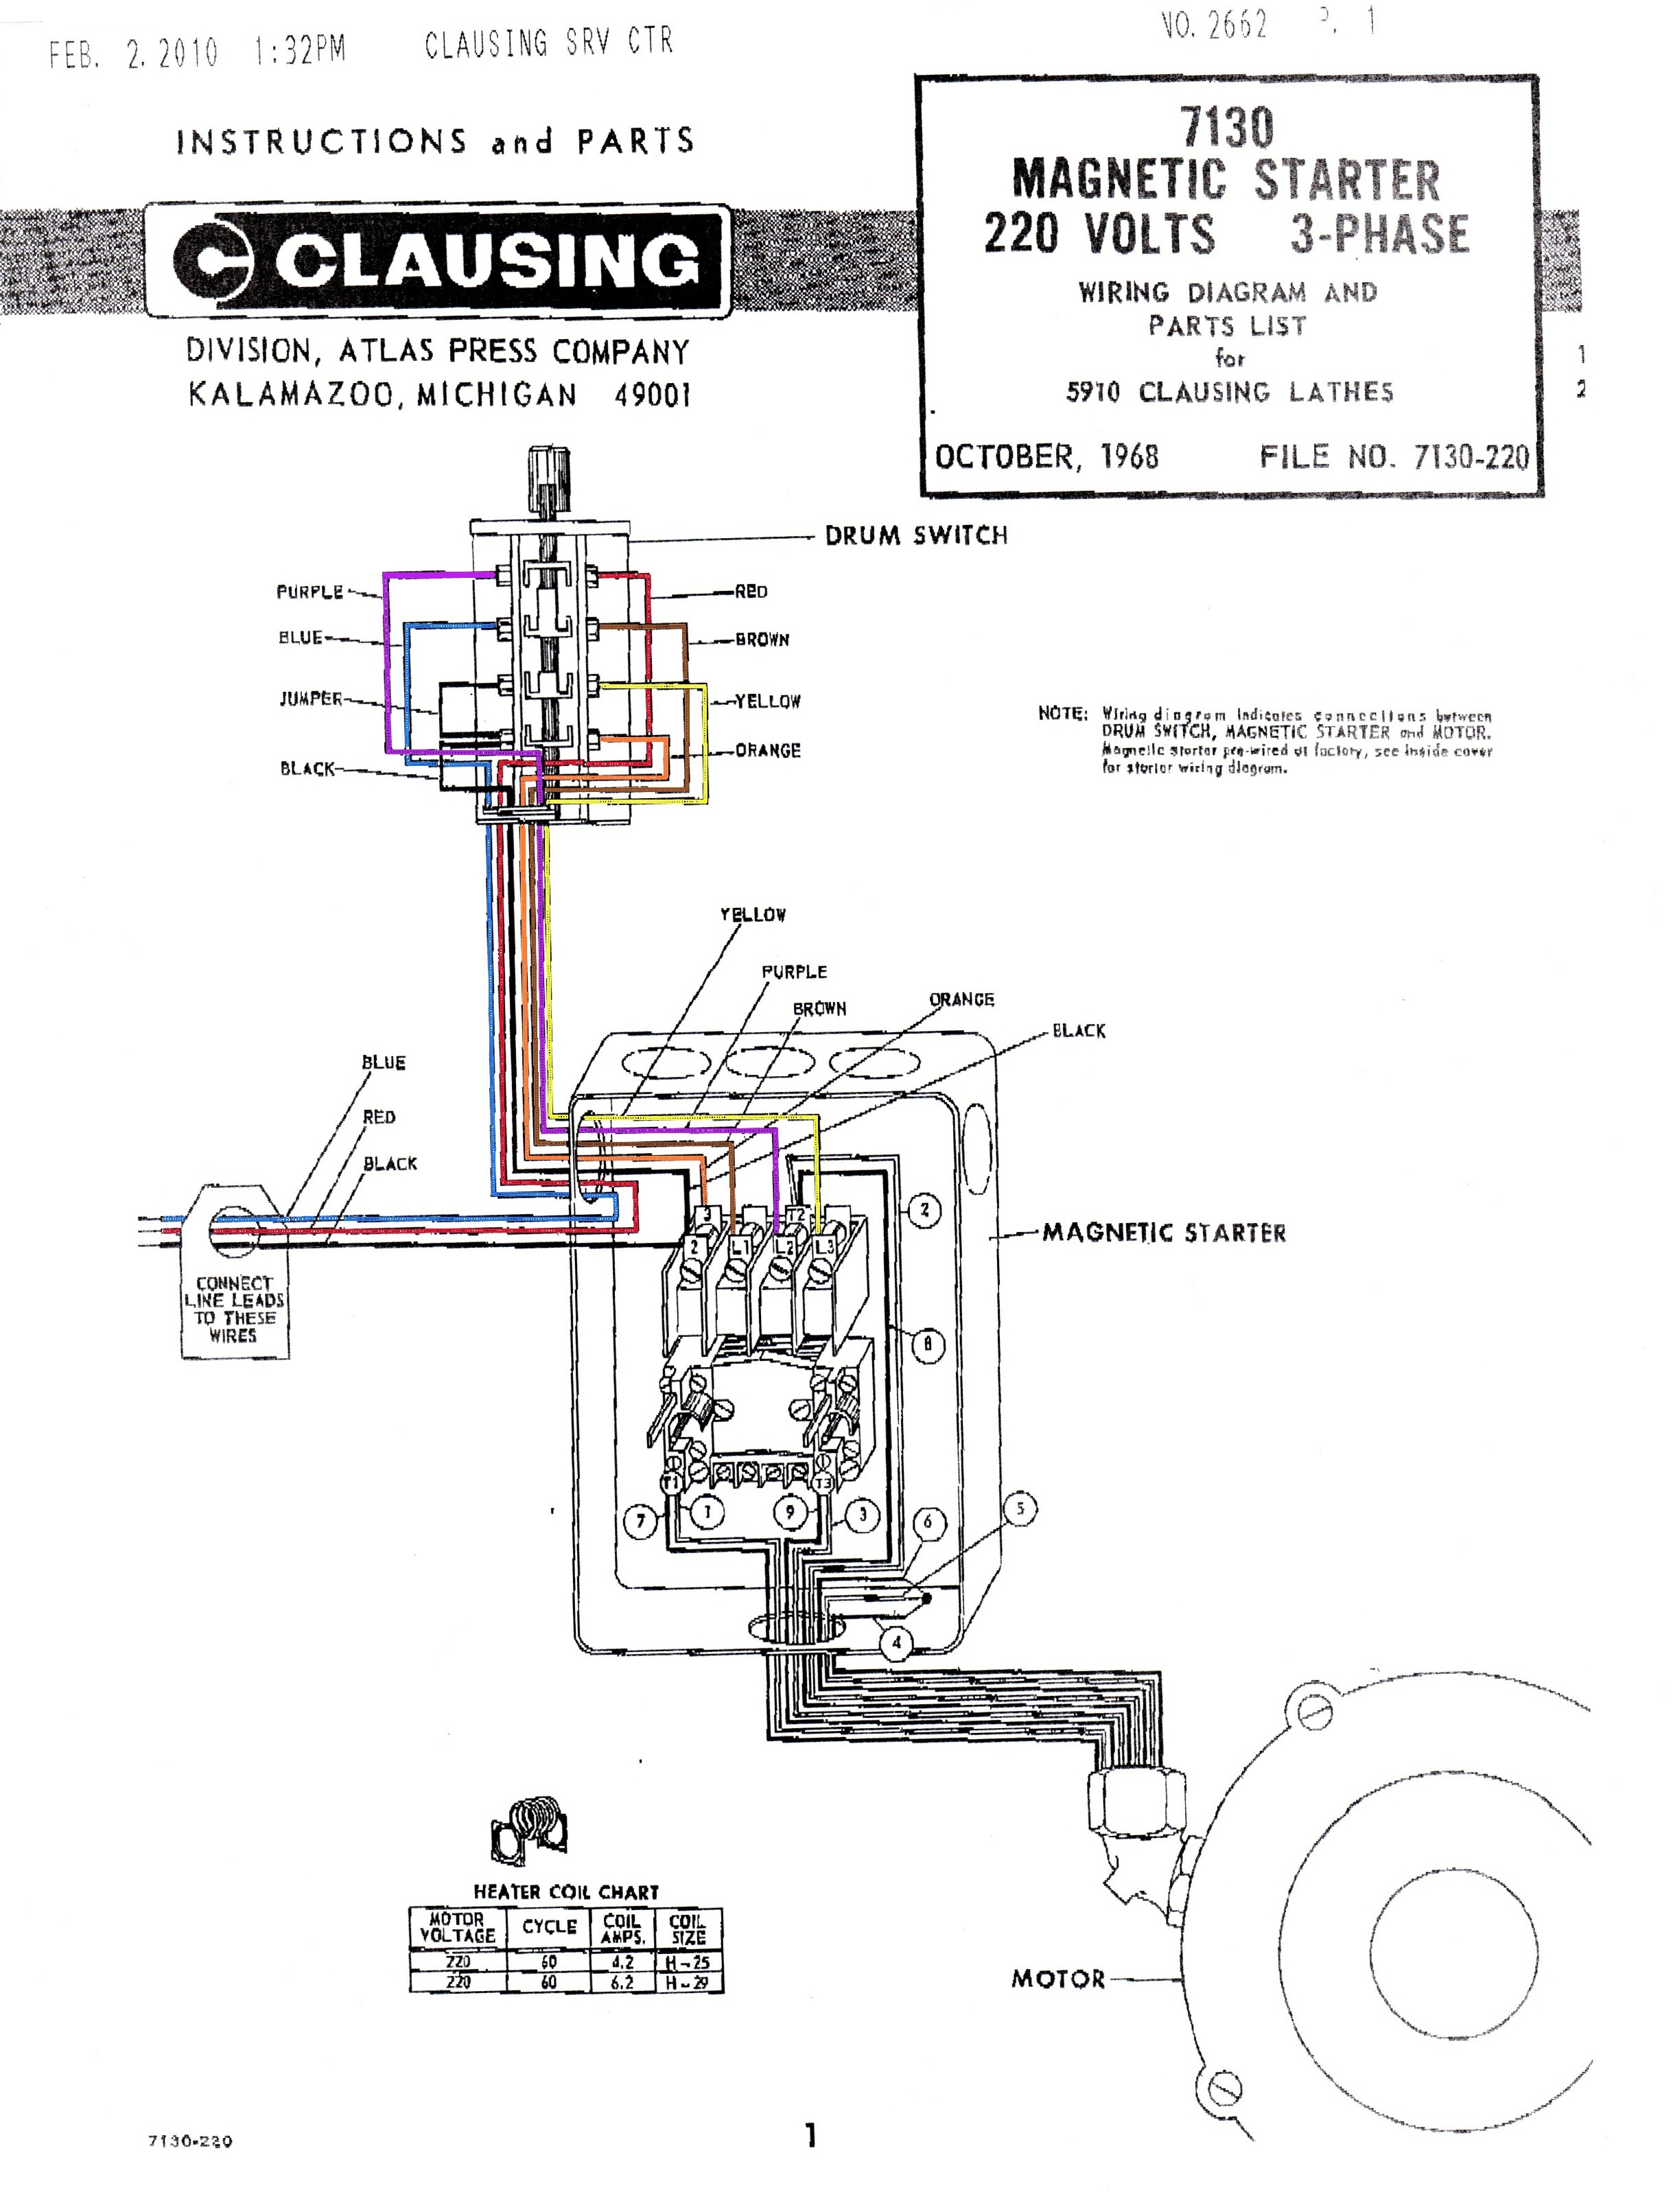 Cutler Hammer Motor Starter Wiring Diagram 2 Magnetic Starter Wiring Diagram Wiring Diagrams • Of Cutler Hammer Motor Starter Wiring Diagram 2